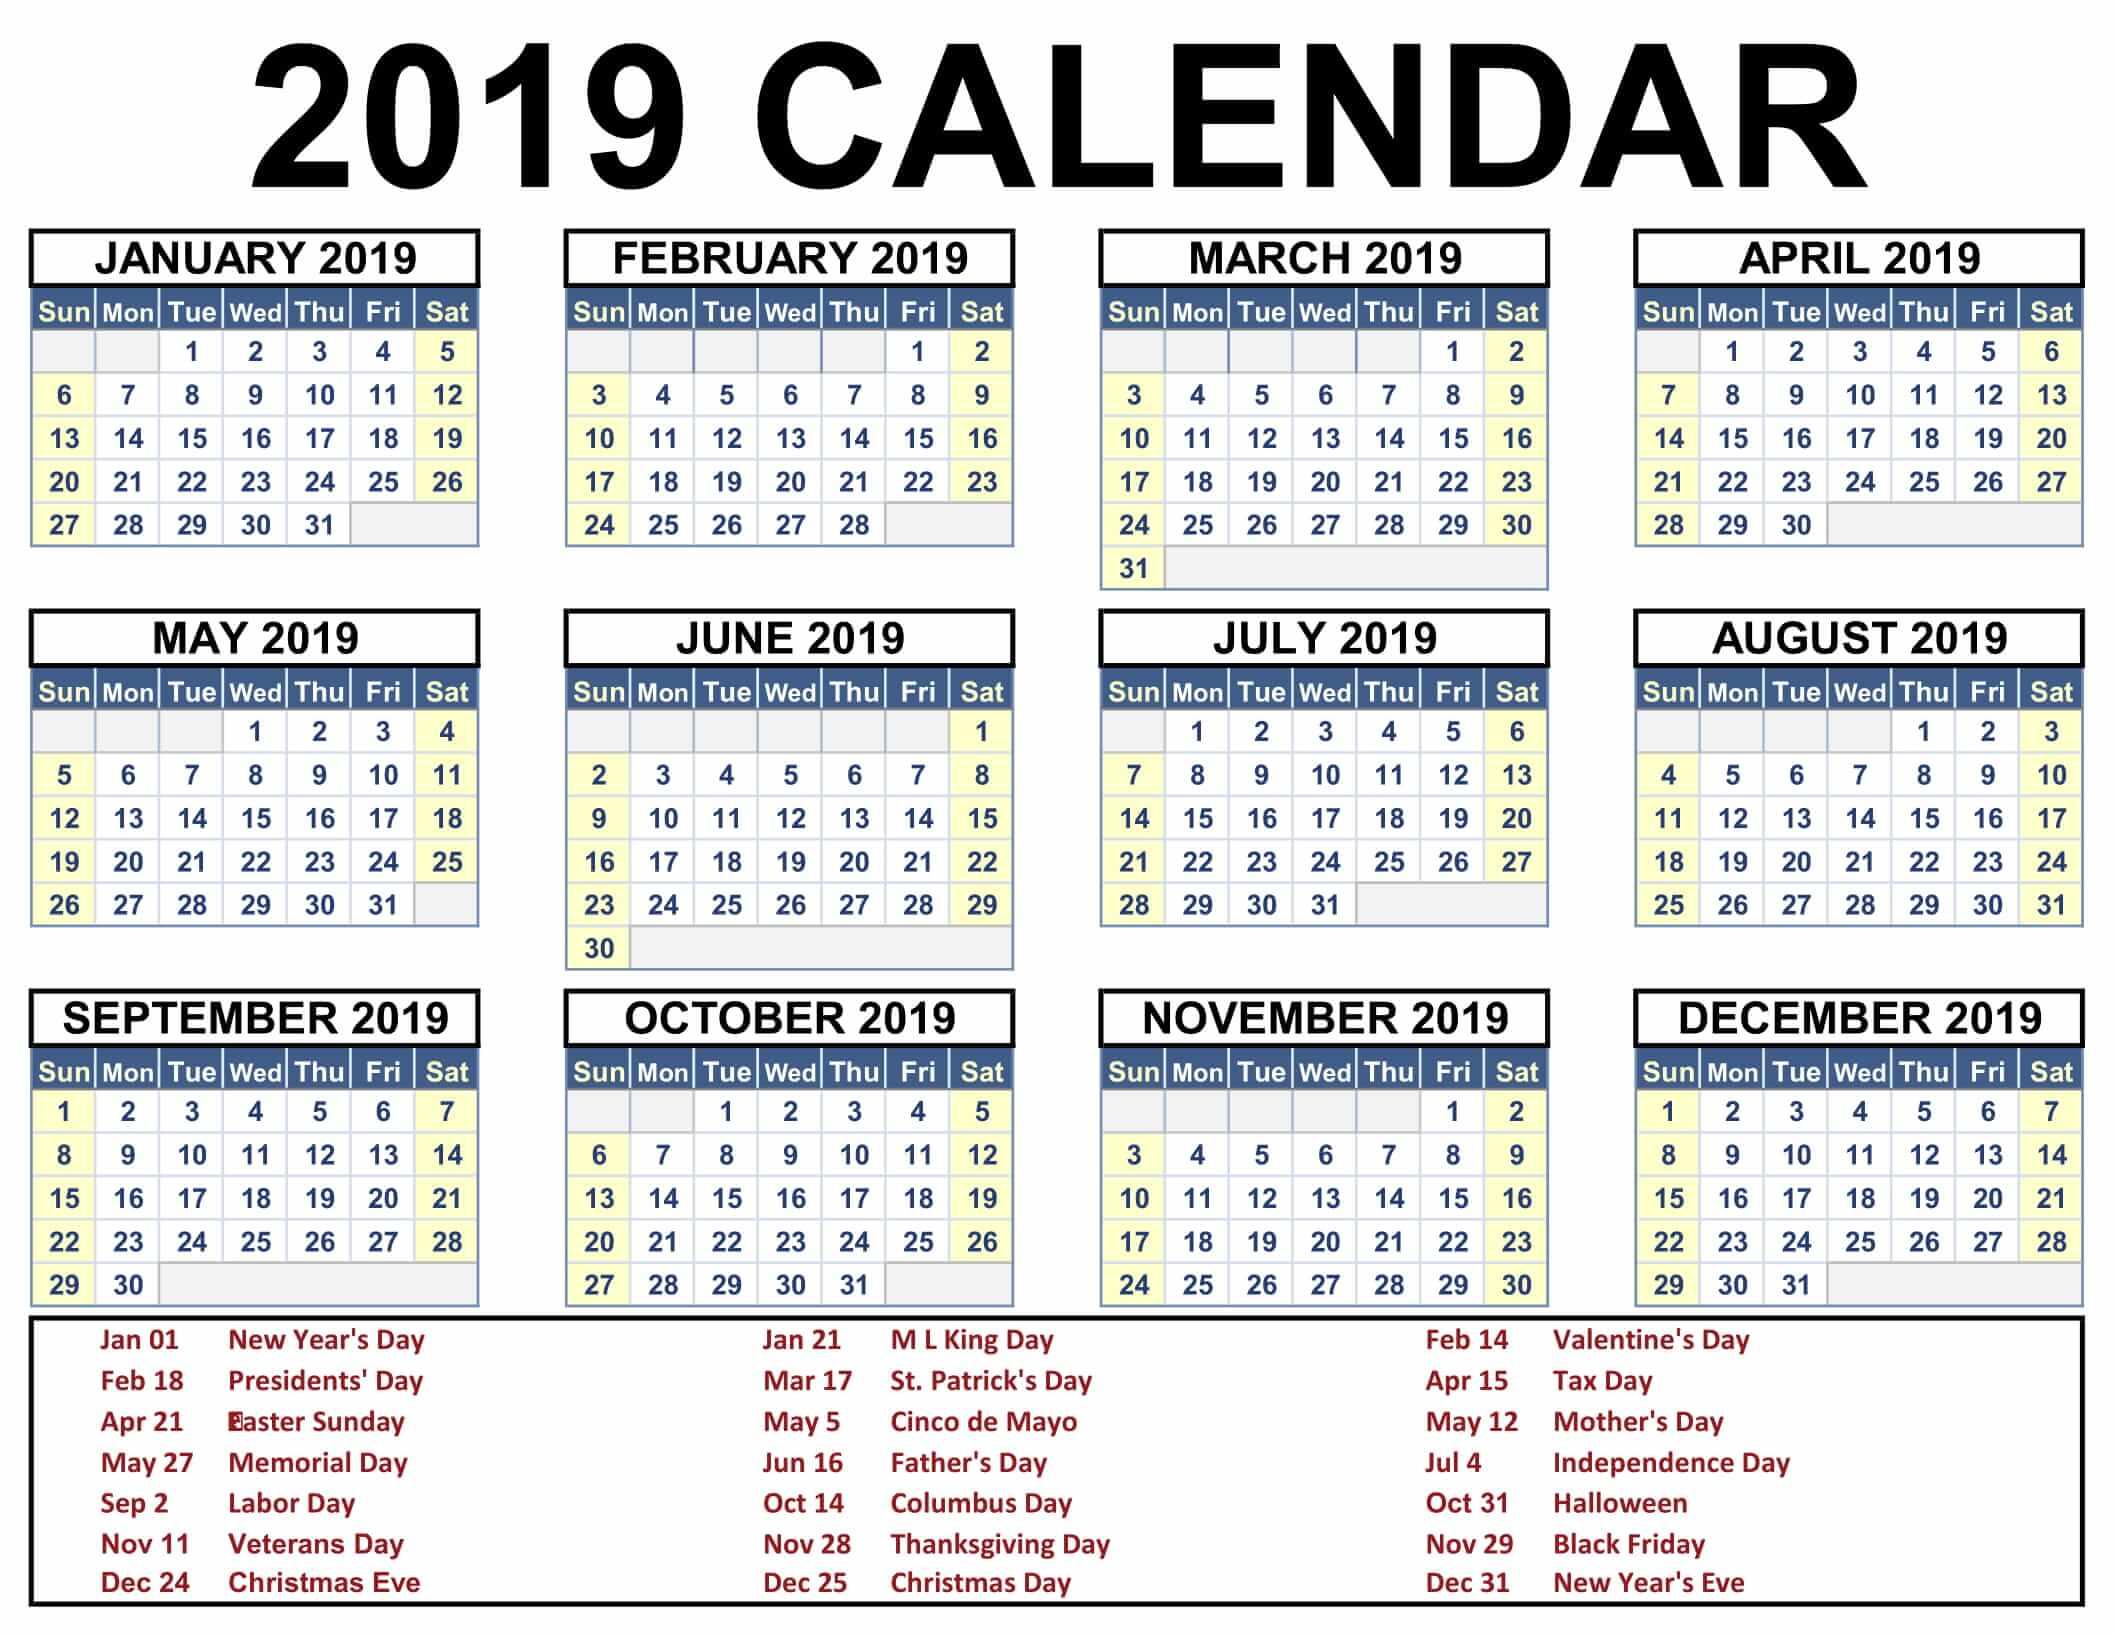 Free Printable Calendar 2019 With Holidays Pdf, Word, Excel